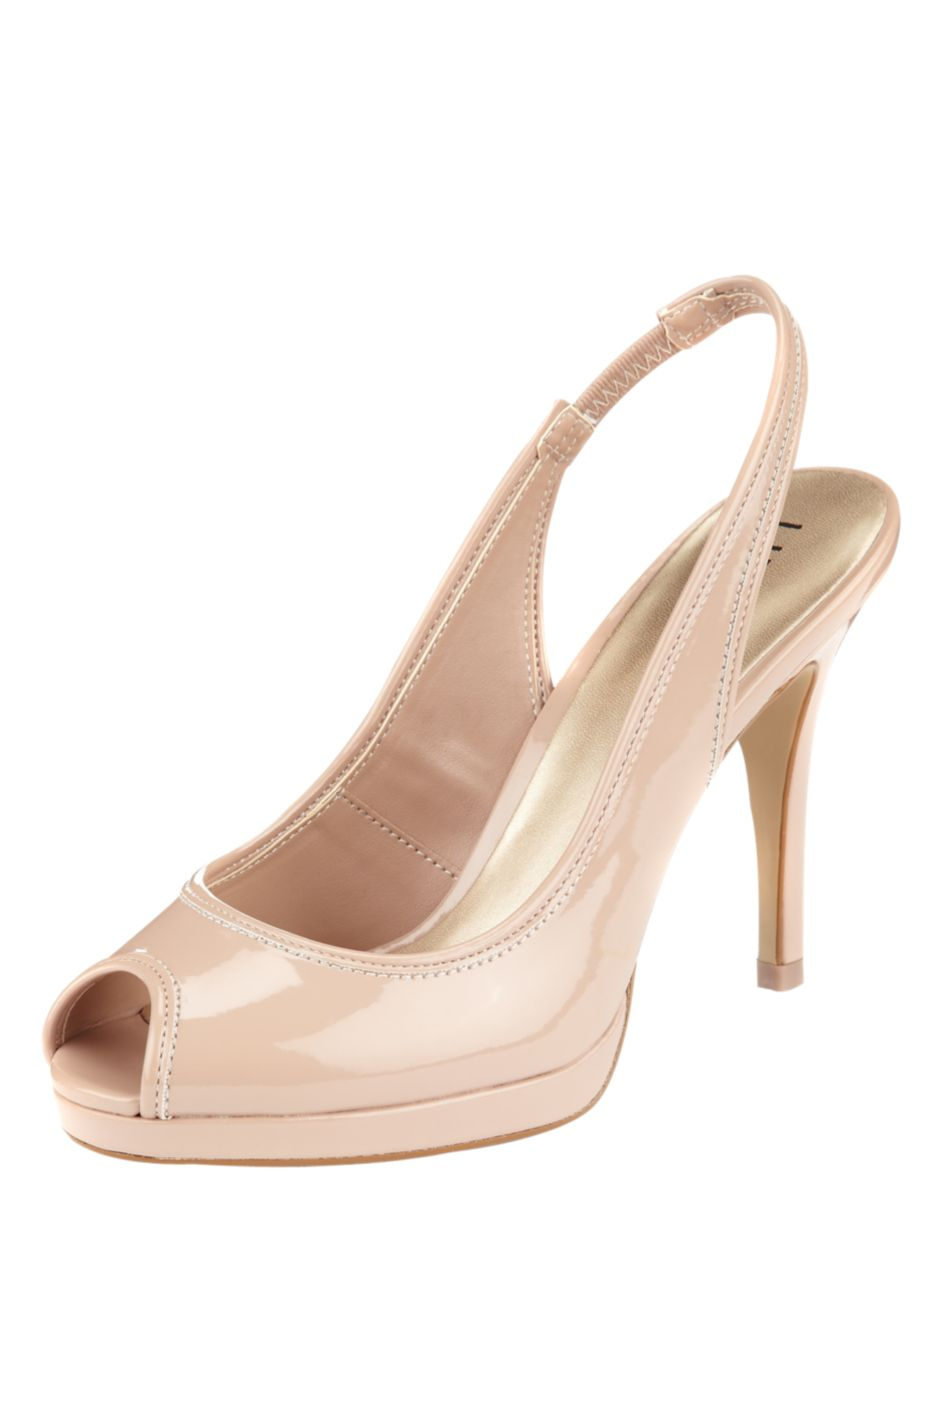 Peep Toe Stiletto Heel Slingback Shoes